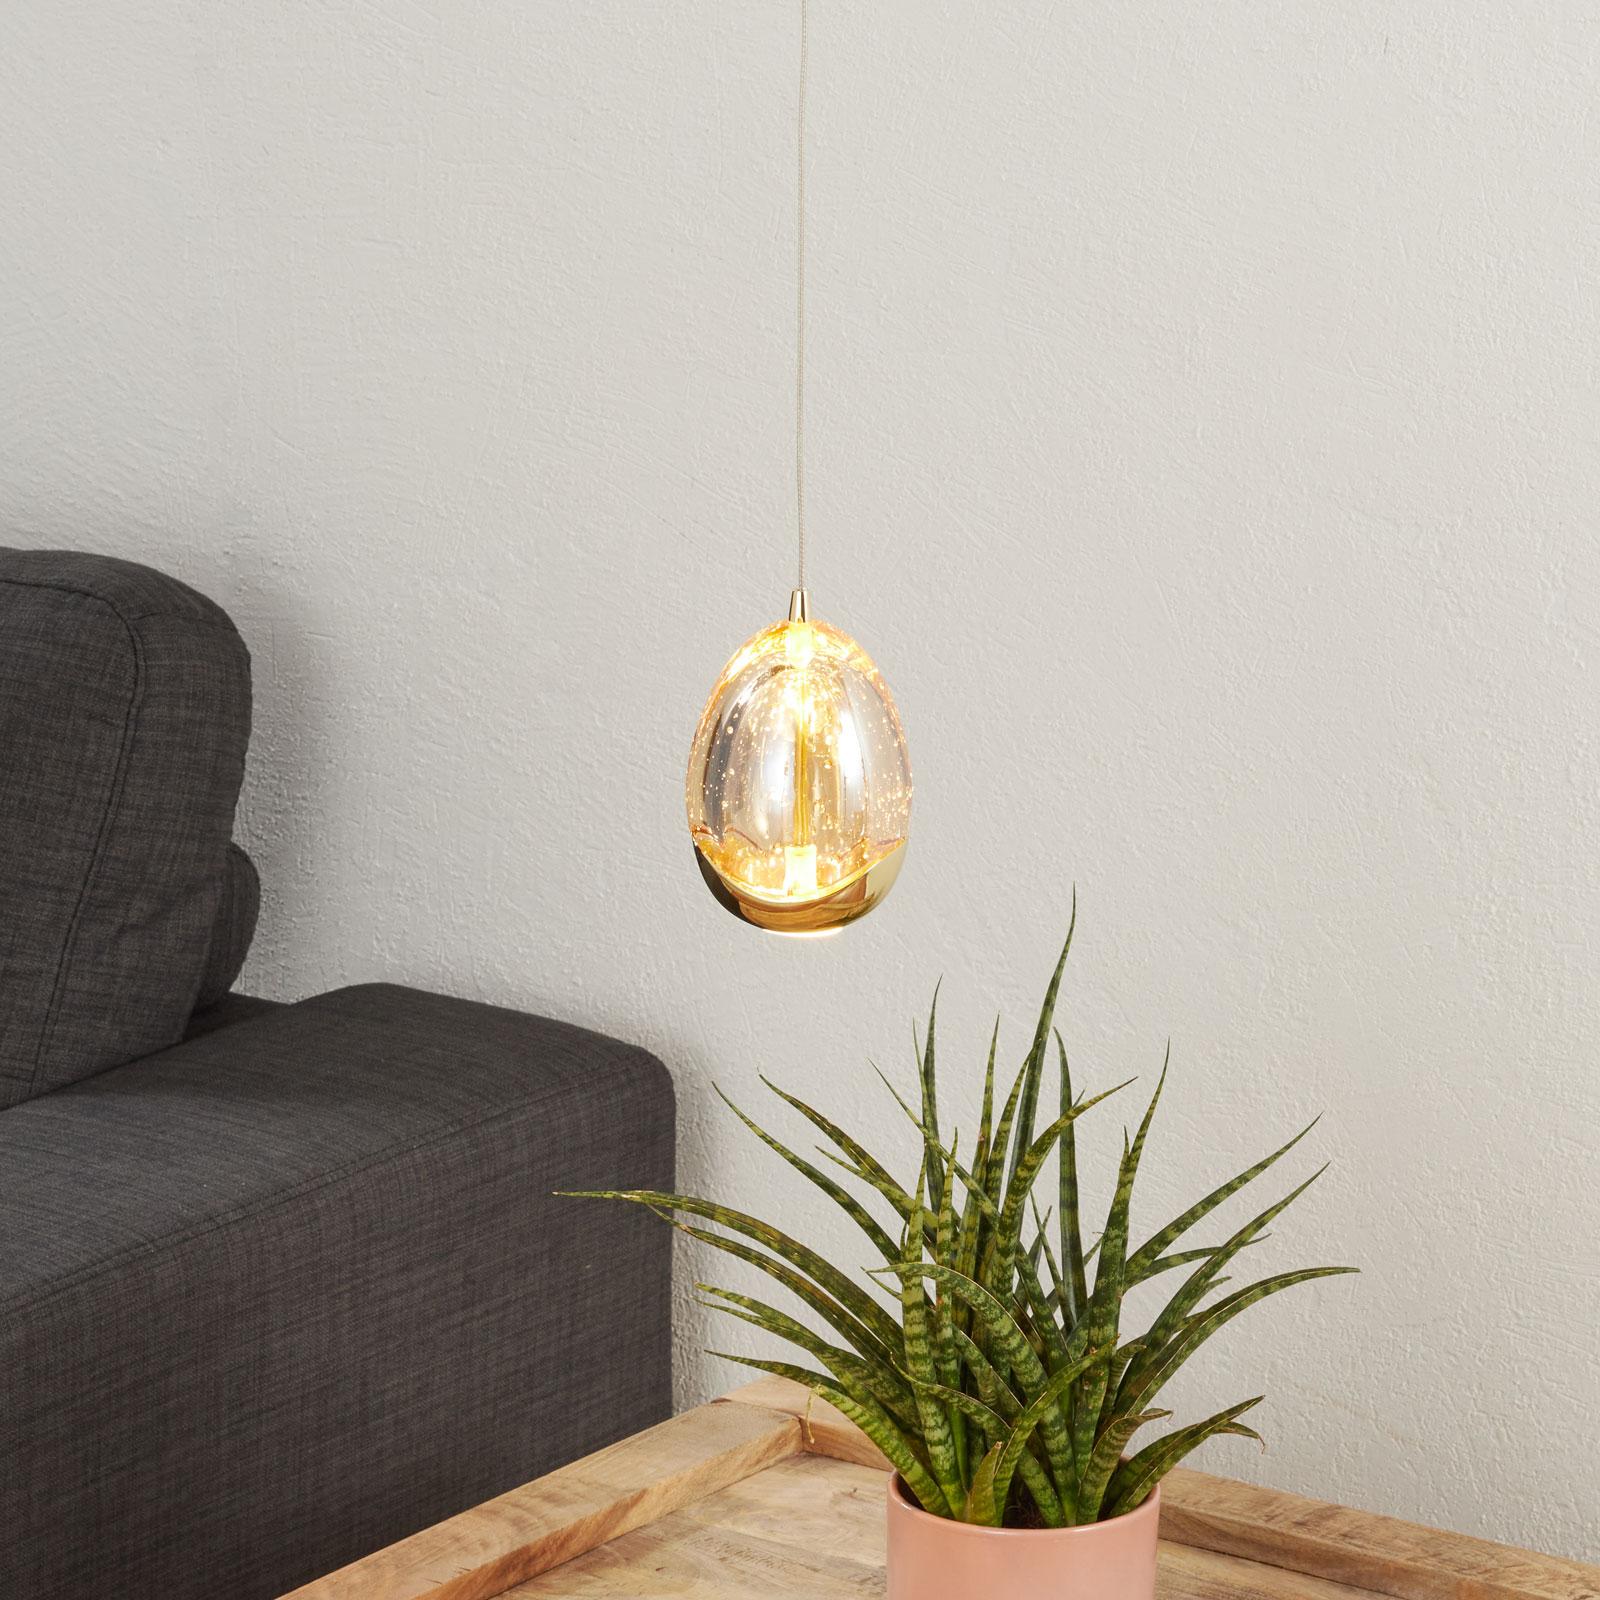 Rocio - LED-hængelampe, guld-finish, 1 lysk.